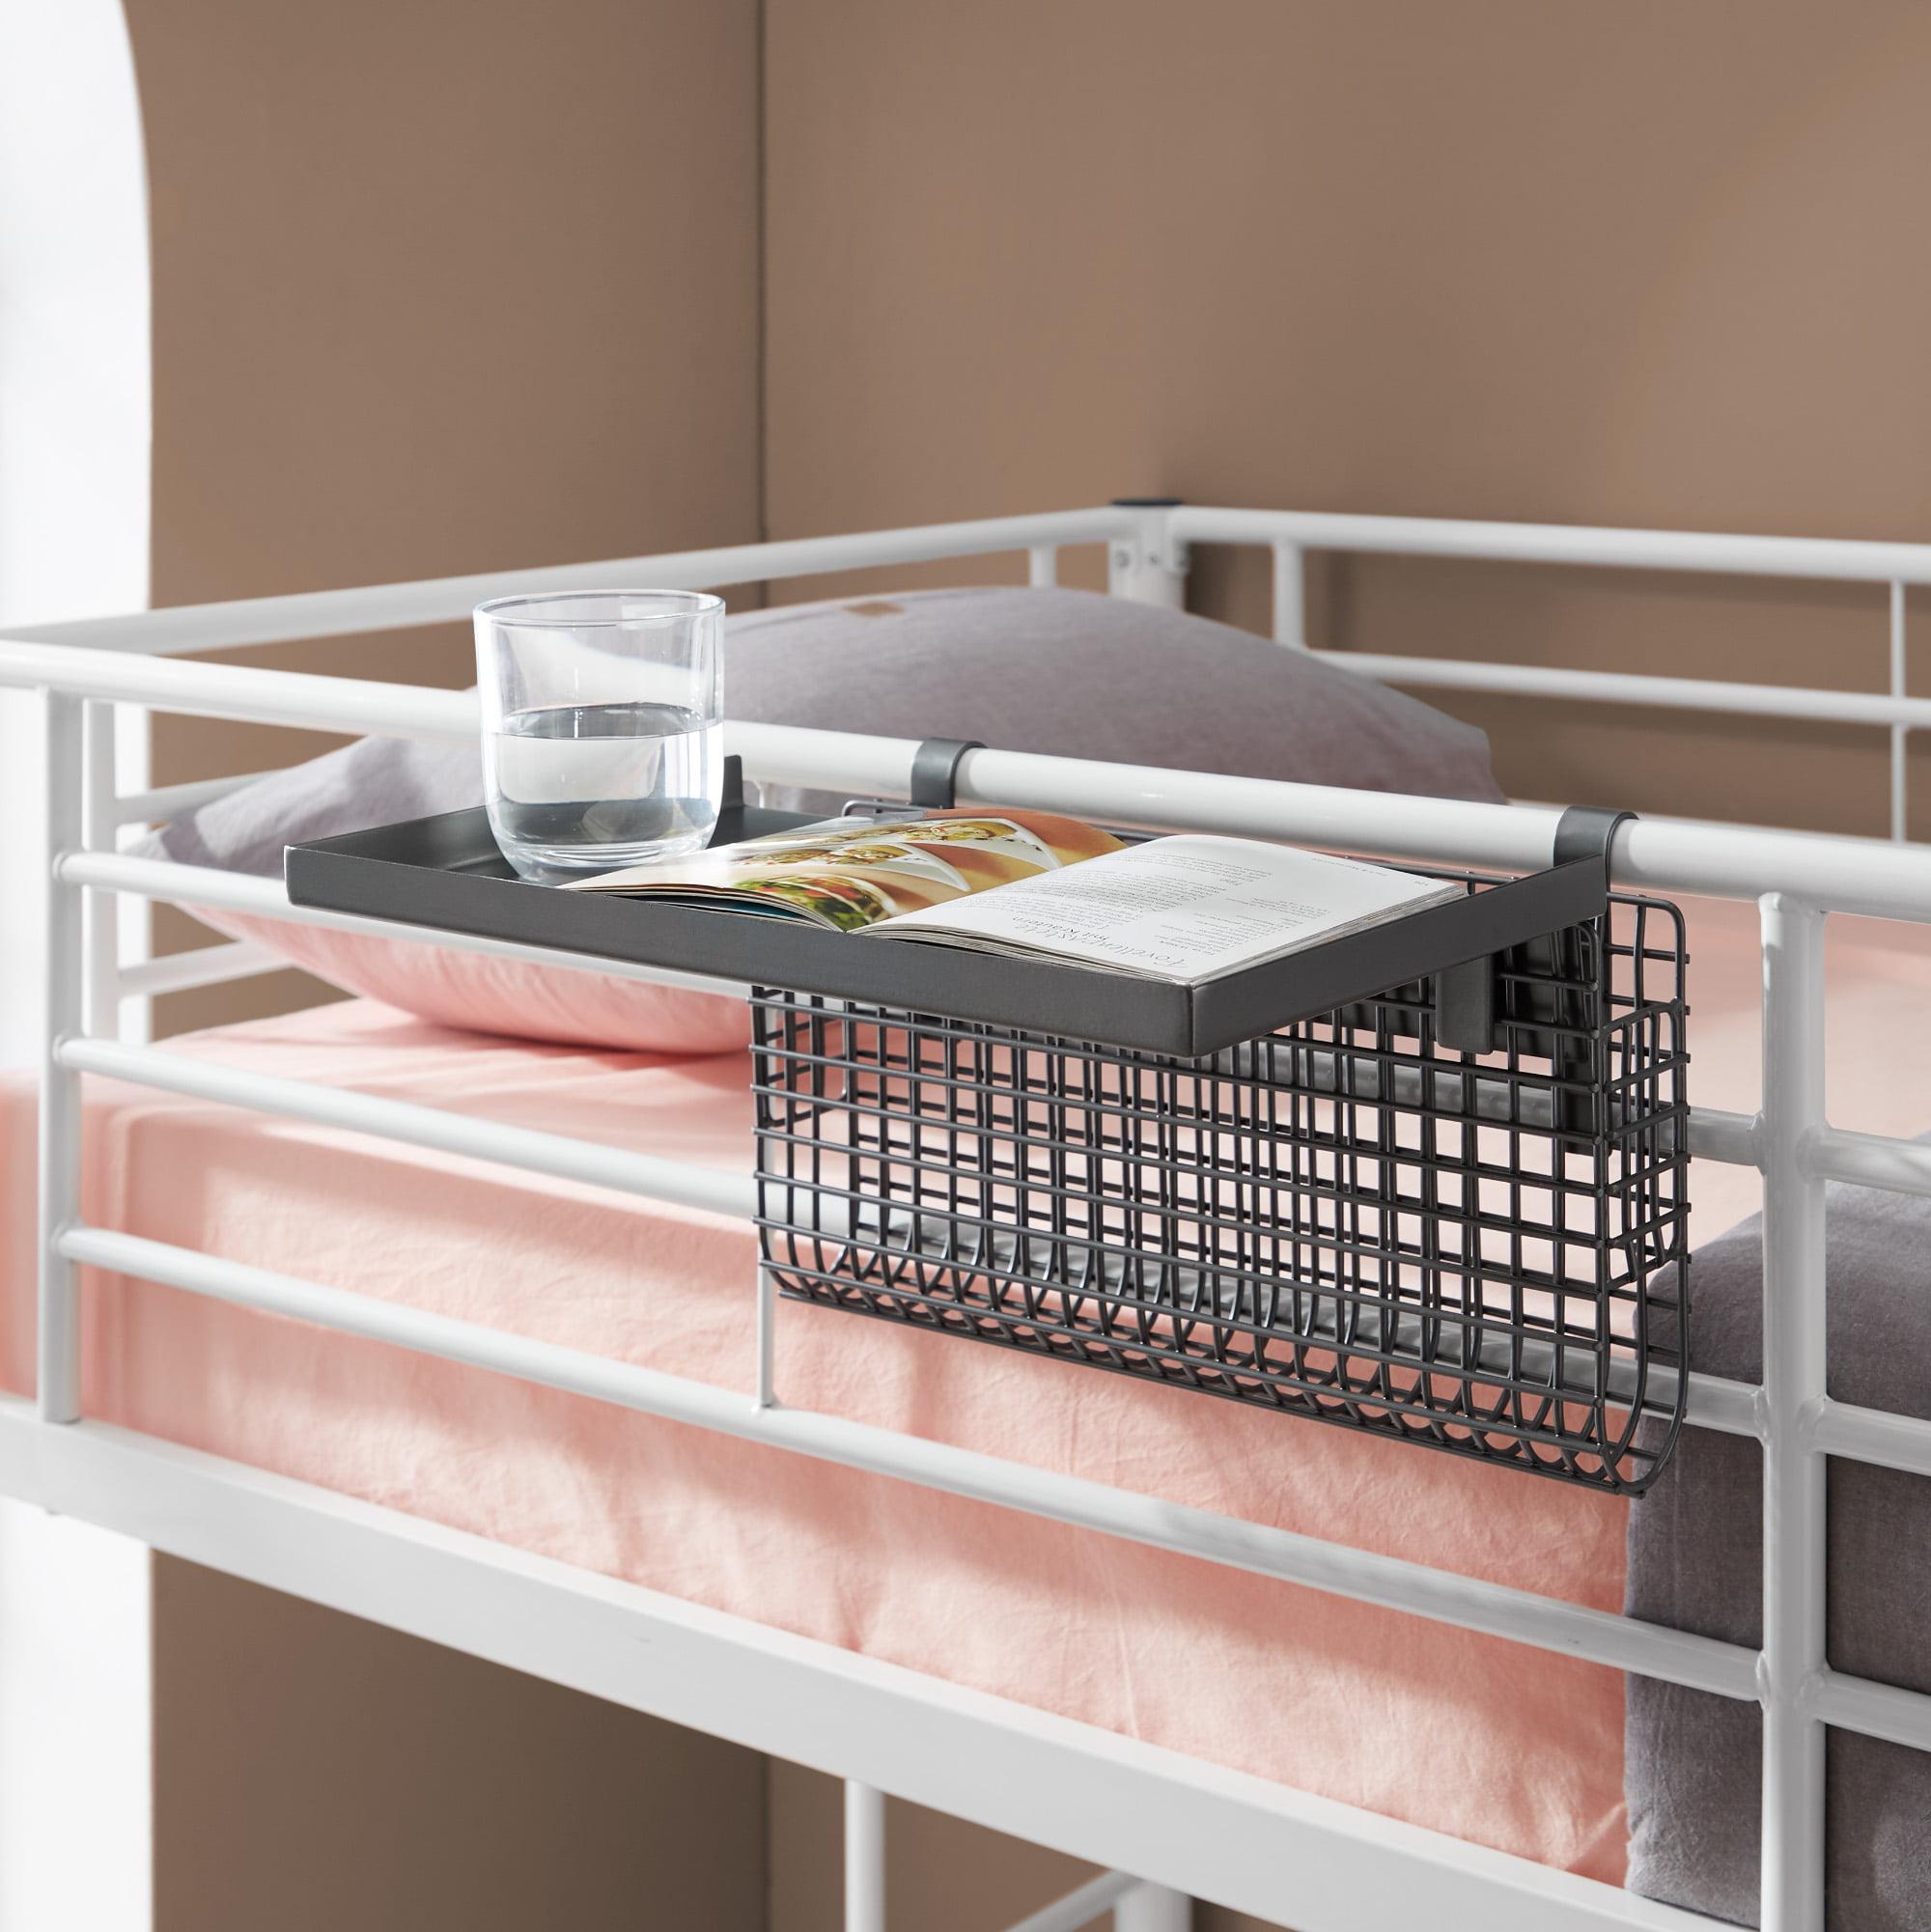 Manor Park Adjustable Metal Bunk Bed Shelf Grey Mesh Walmart Com Walmart Com